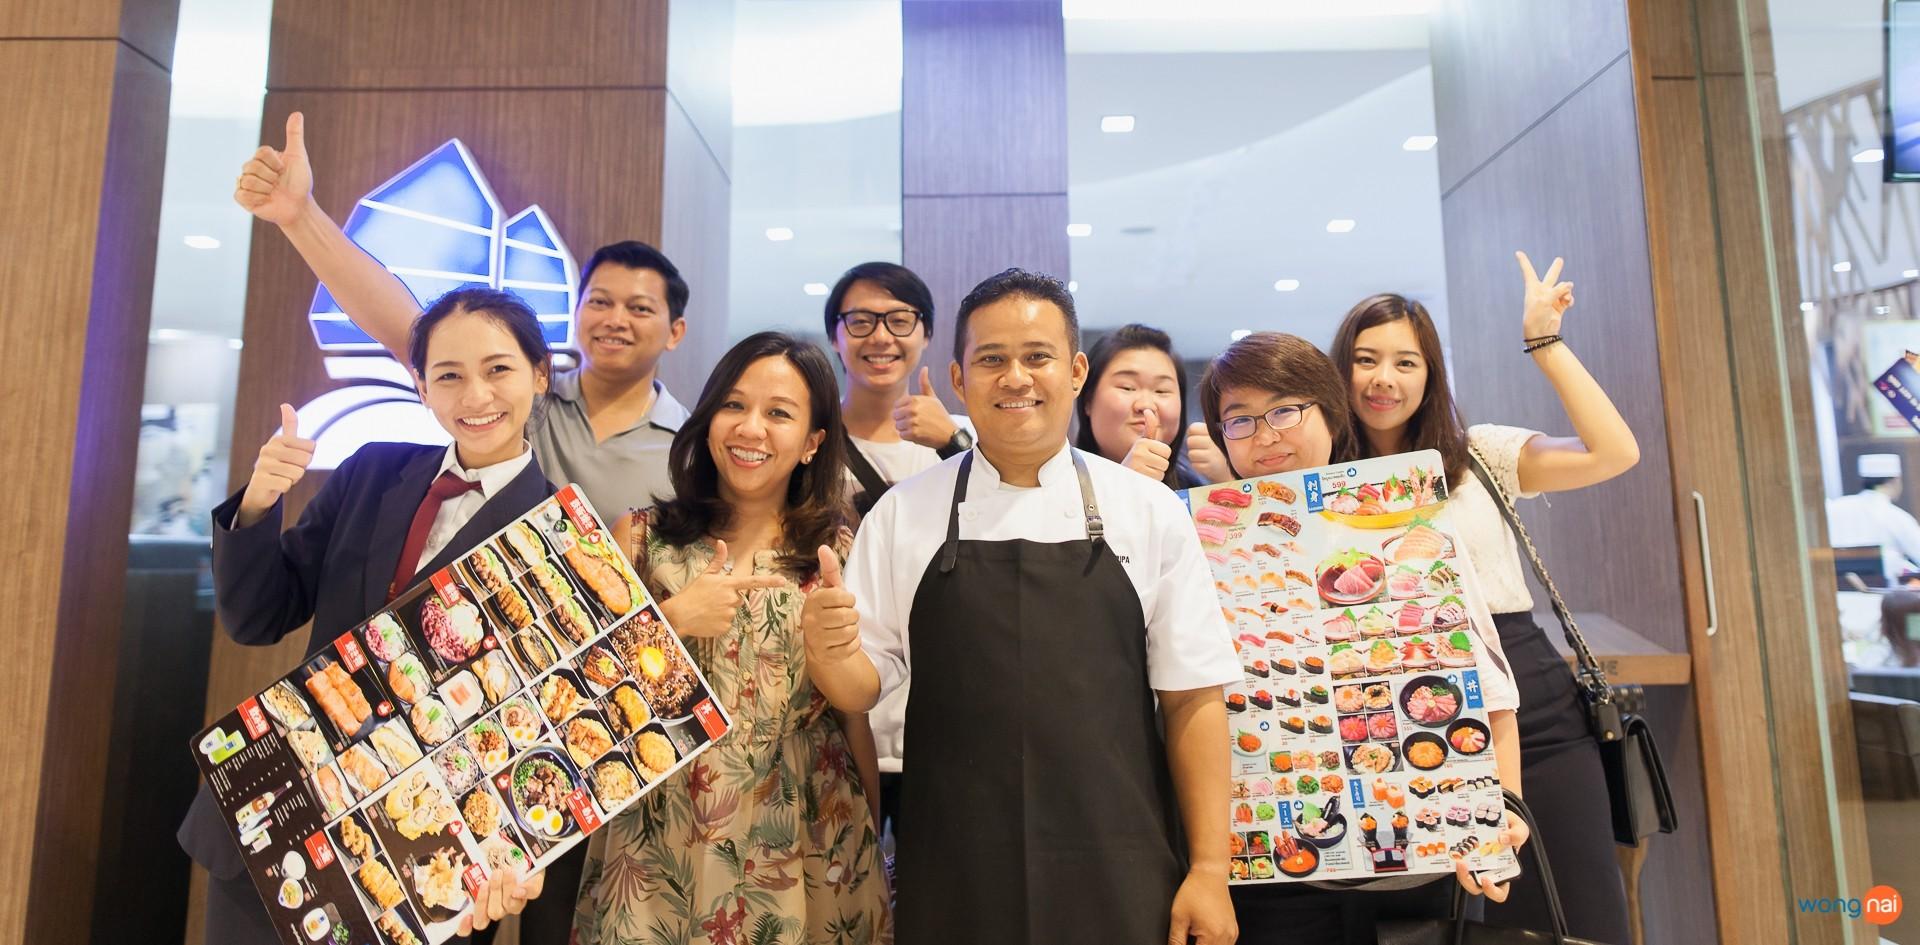 Wongnai Tasting x Kobune กินอิ่มอย่างจุใจกับอาหารญี่ปุ่นหลากหลายเมนู!